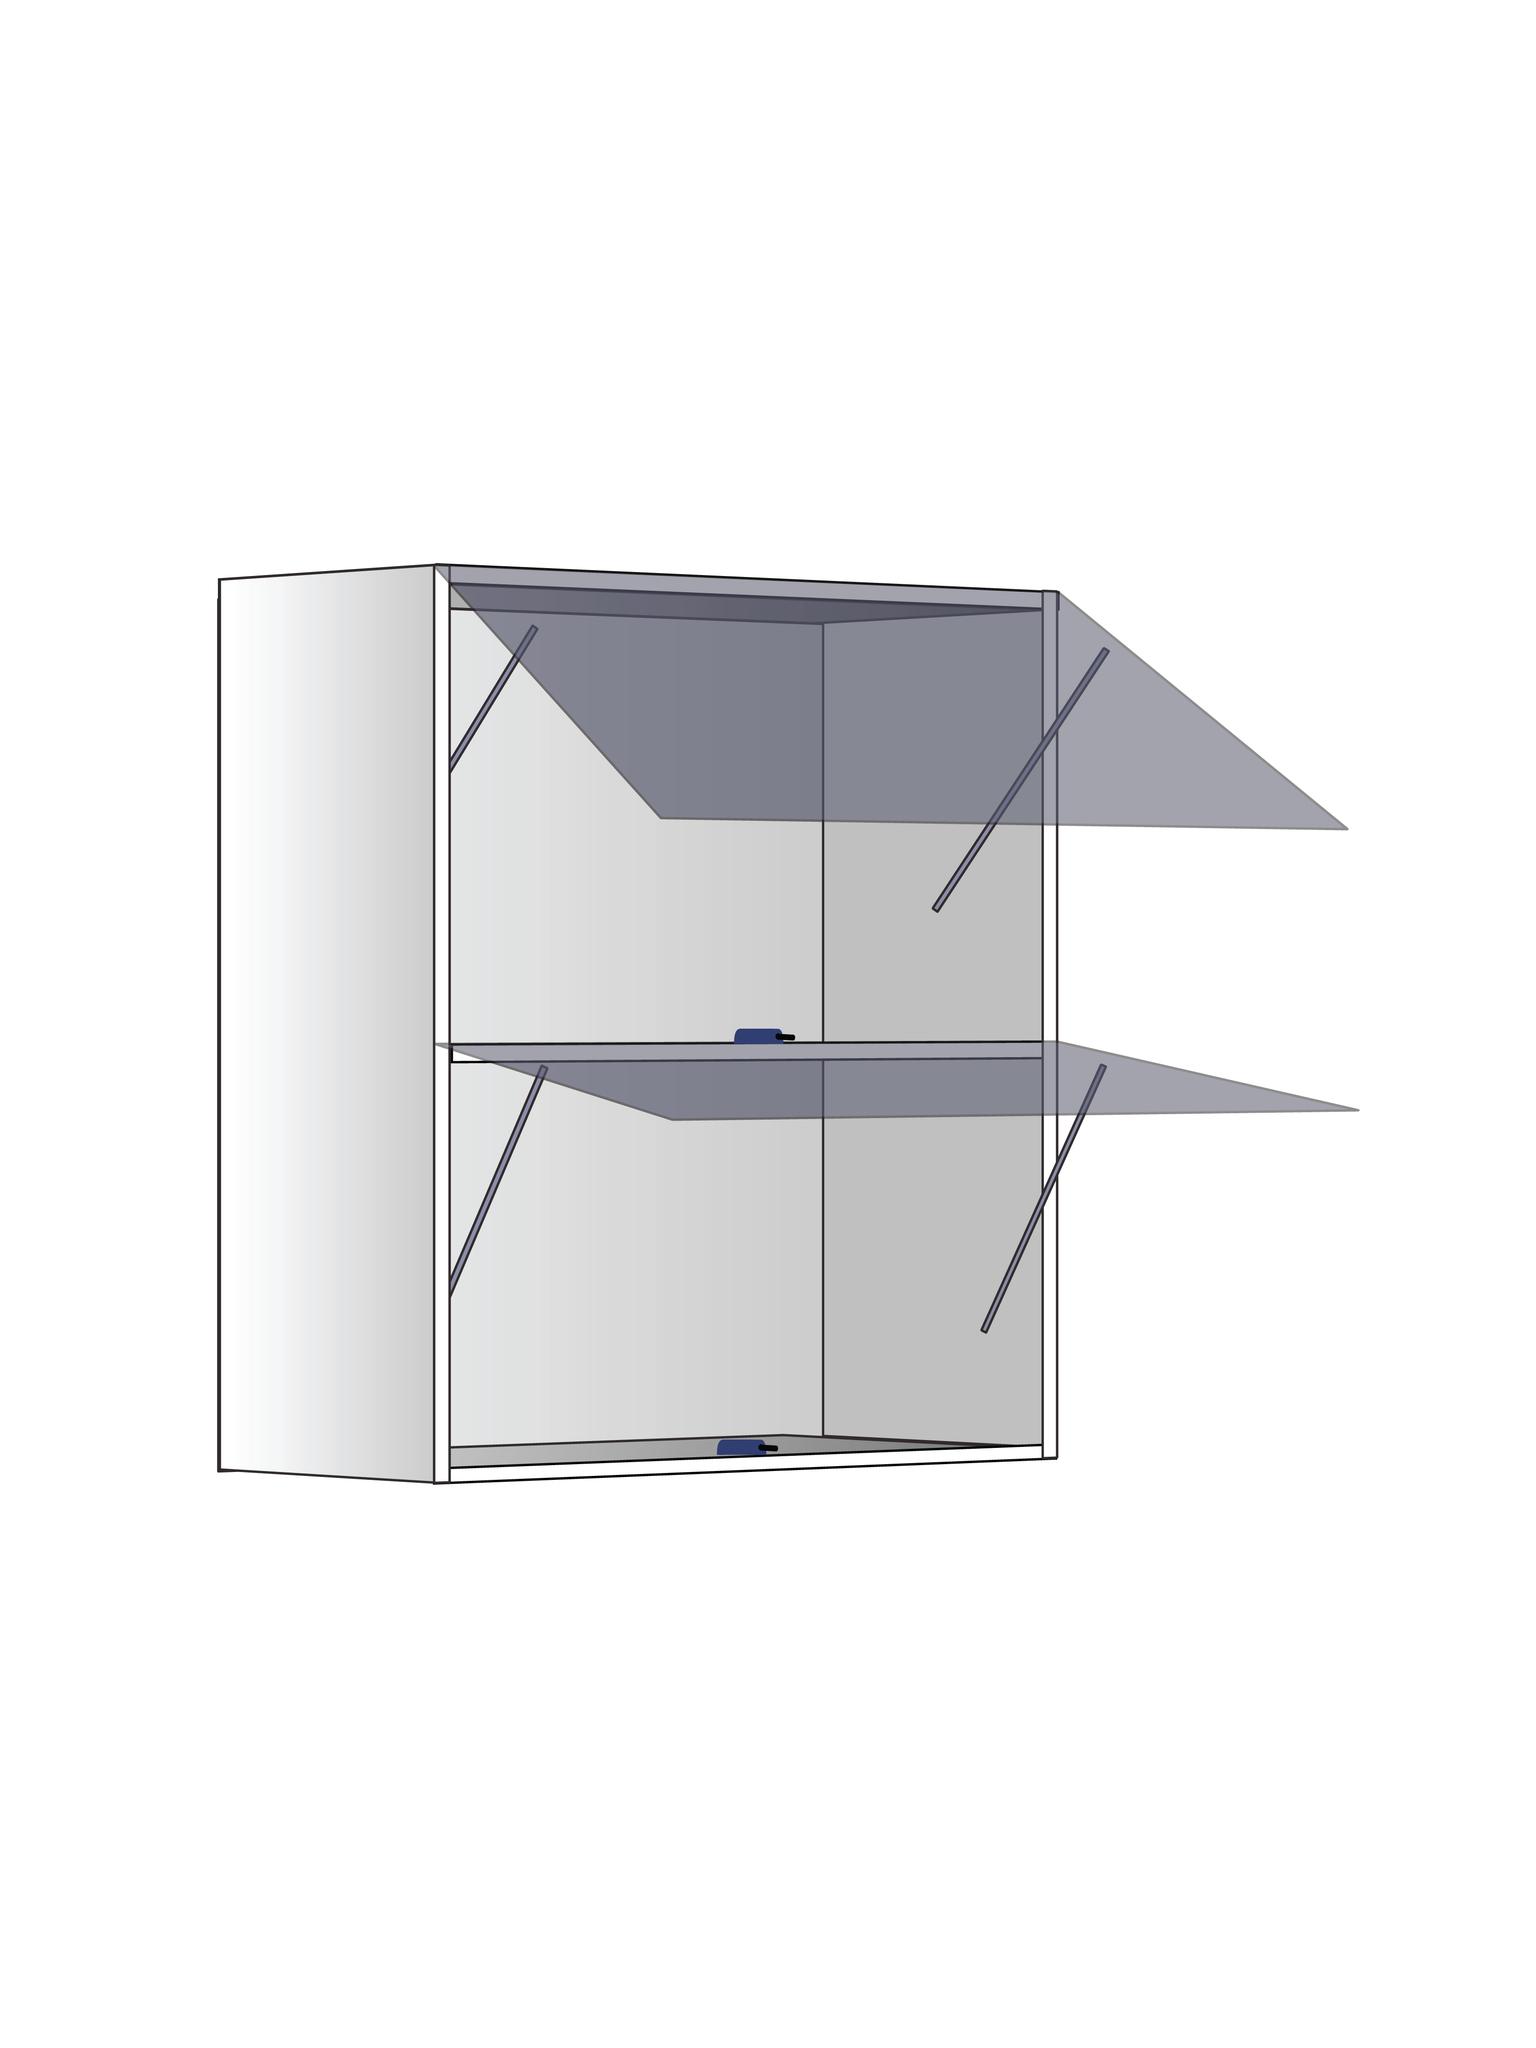 Верхний шкаф c полкой и газлифтами, 720Х600 мм / PushToOpen